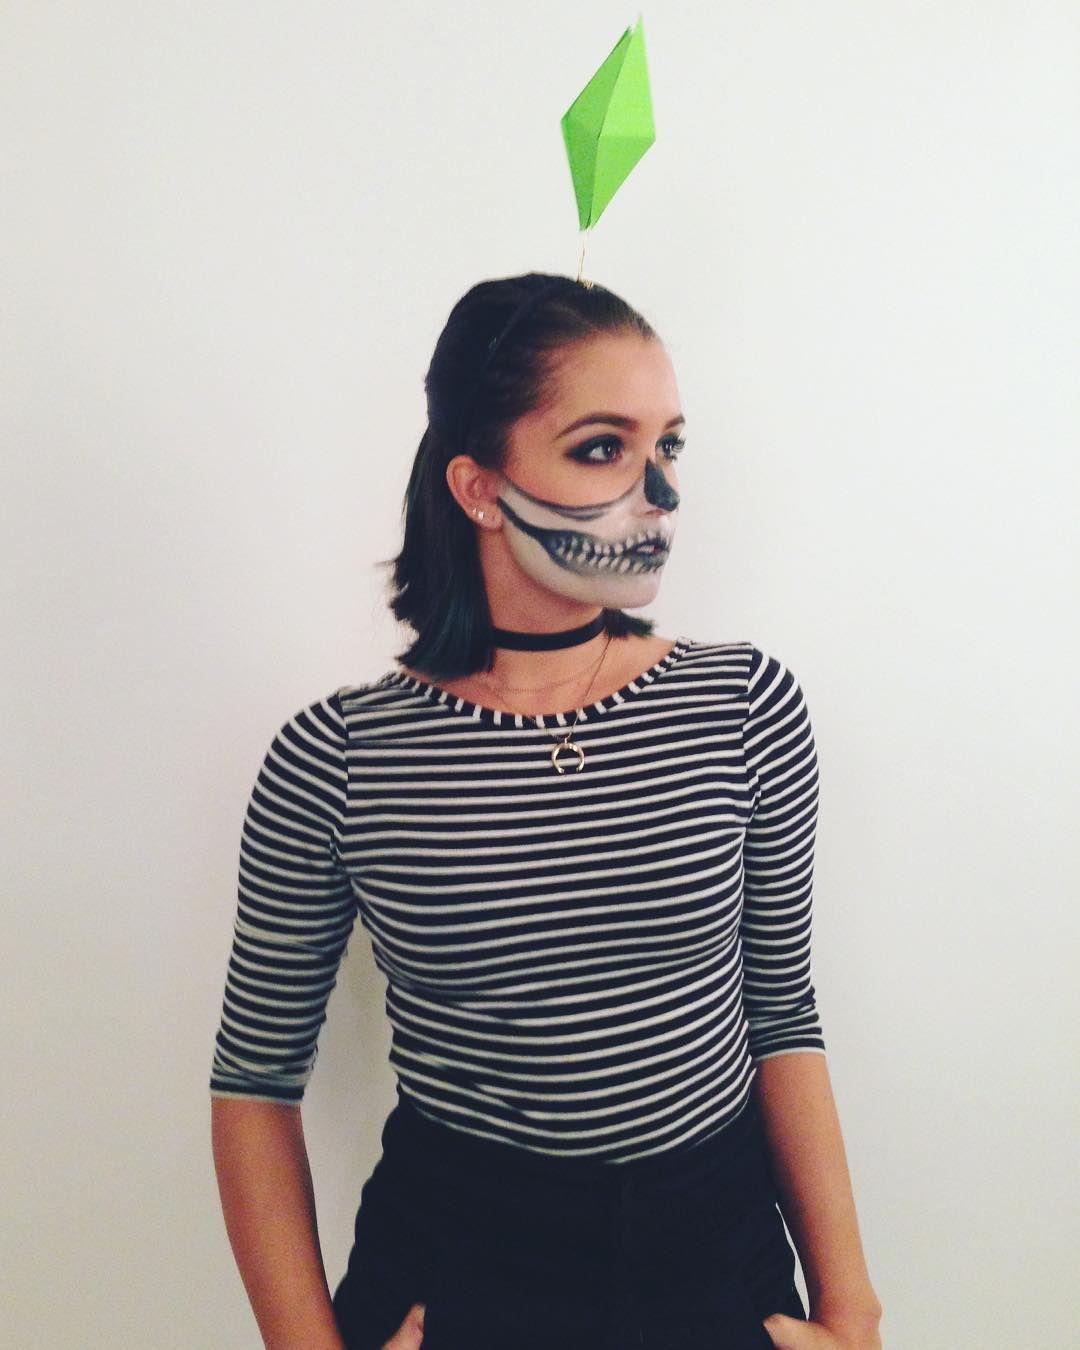 Diy Sim Costume Sims Costume Easy Halloween Costumes Sims Halloween Costume